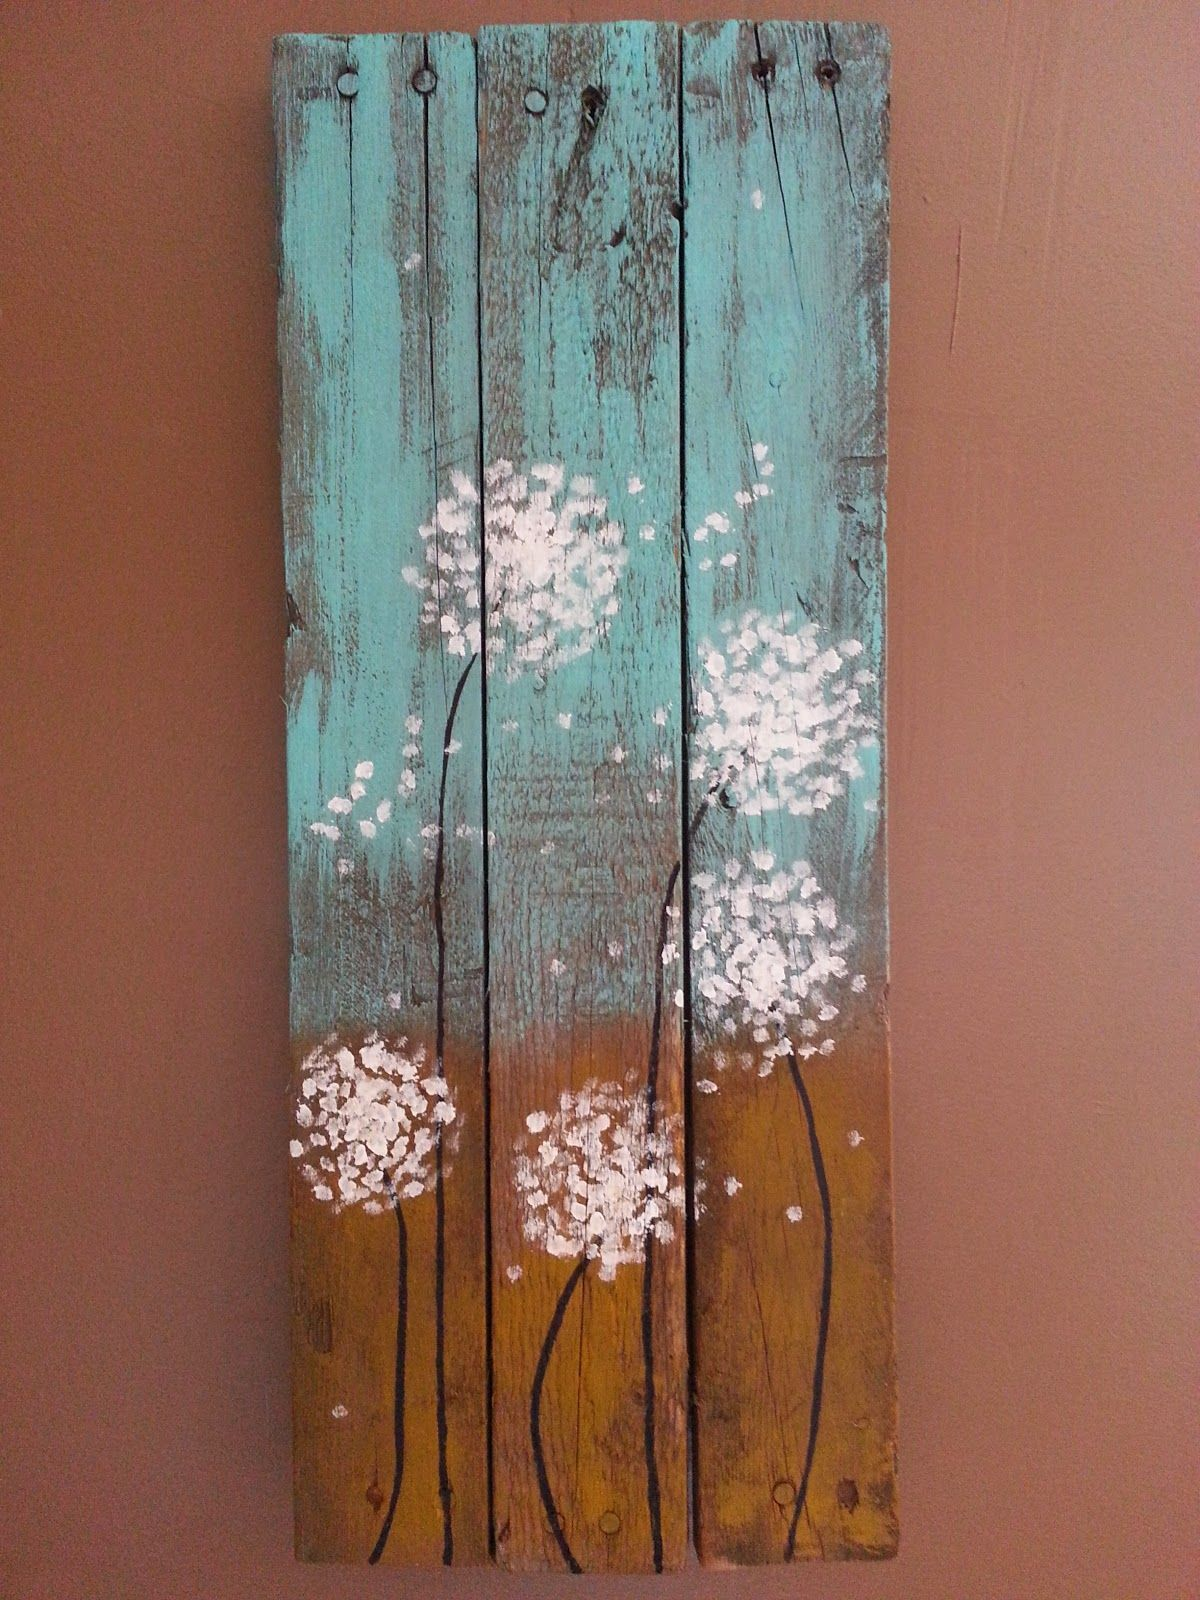 dandelions love this! - my favorite soacrylic painting on